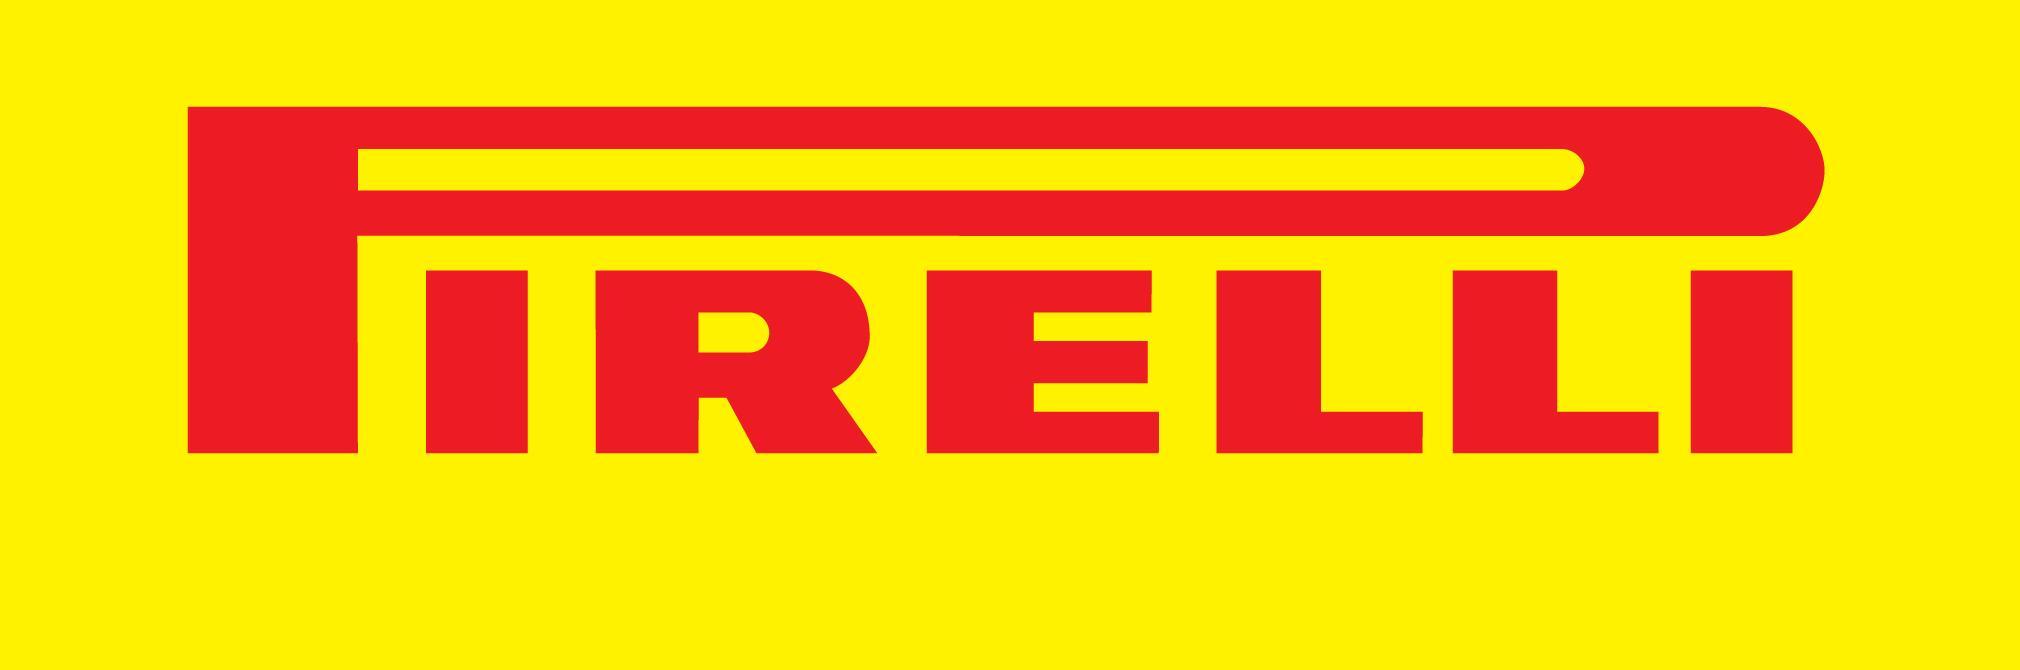 9. Pirelli